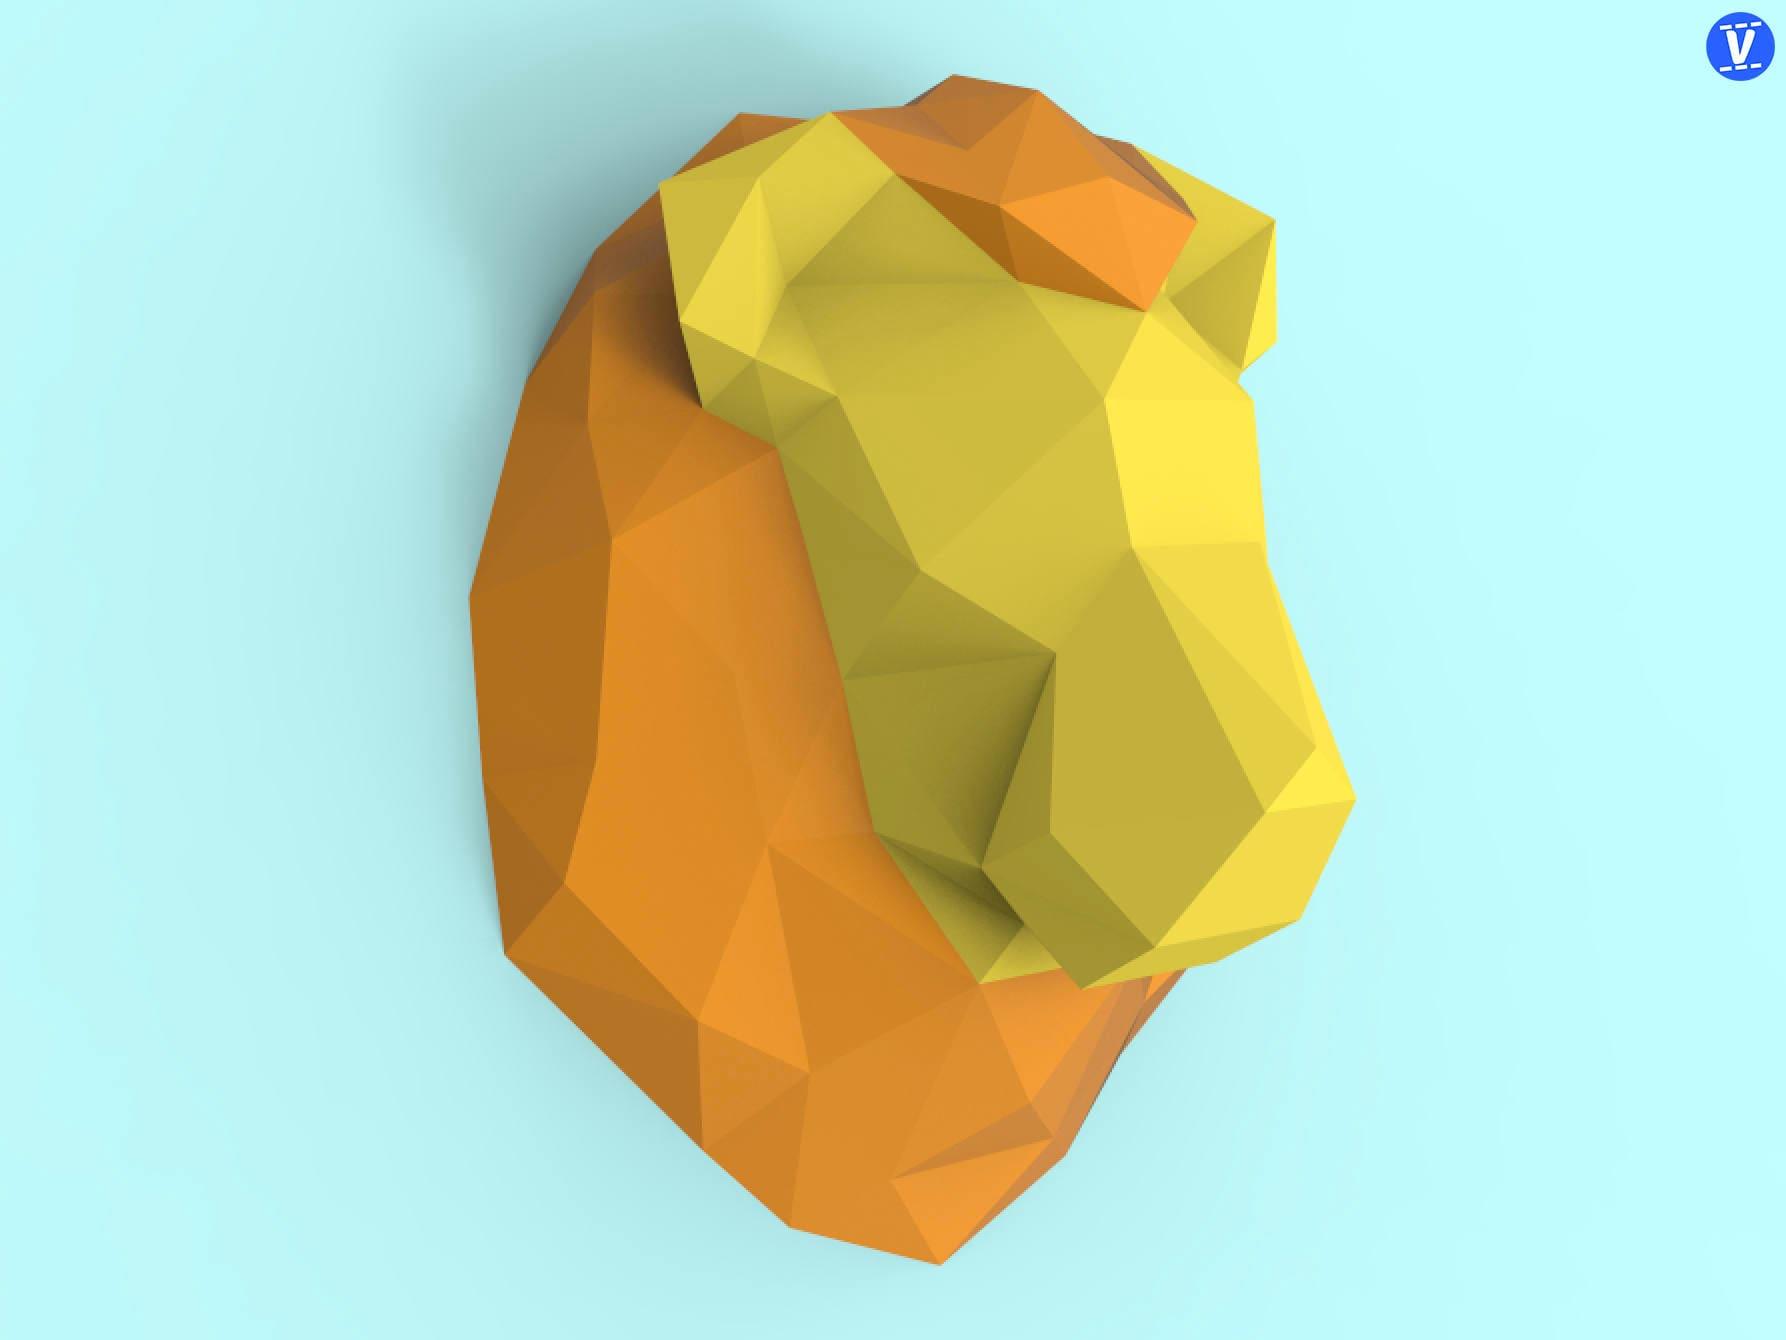 Lion Head Papercraft PDF Pack - 3D Paper Sculpture Template with ...